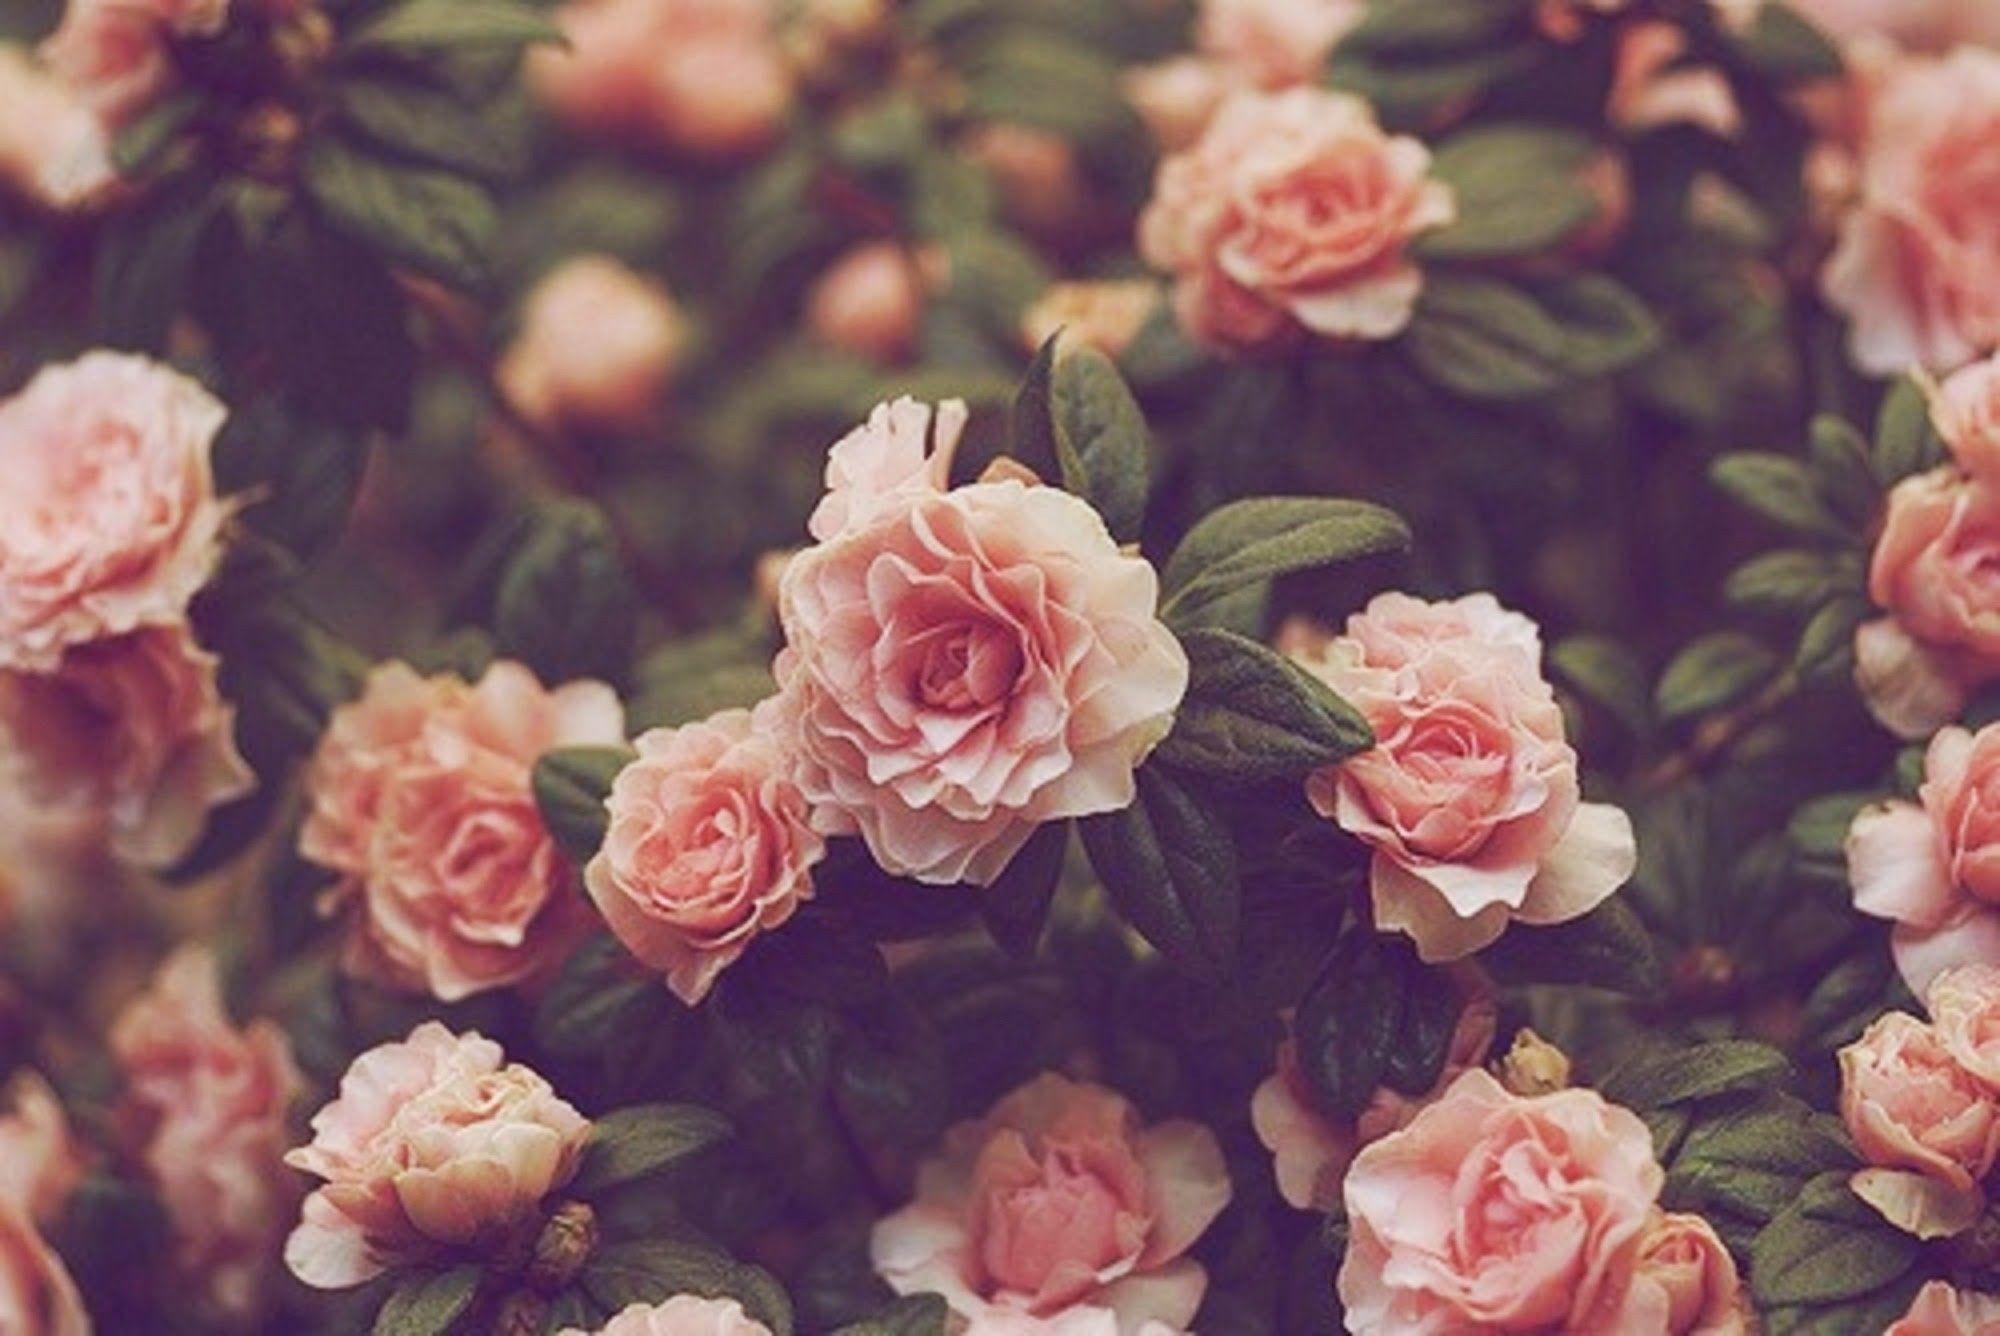 Floral Background Tumblr Buscar Con Google Dengan Gambar